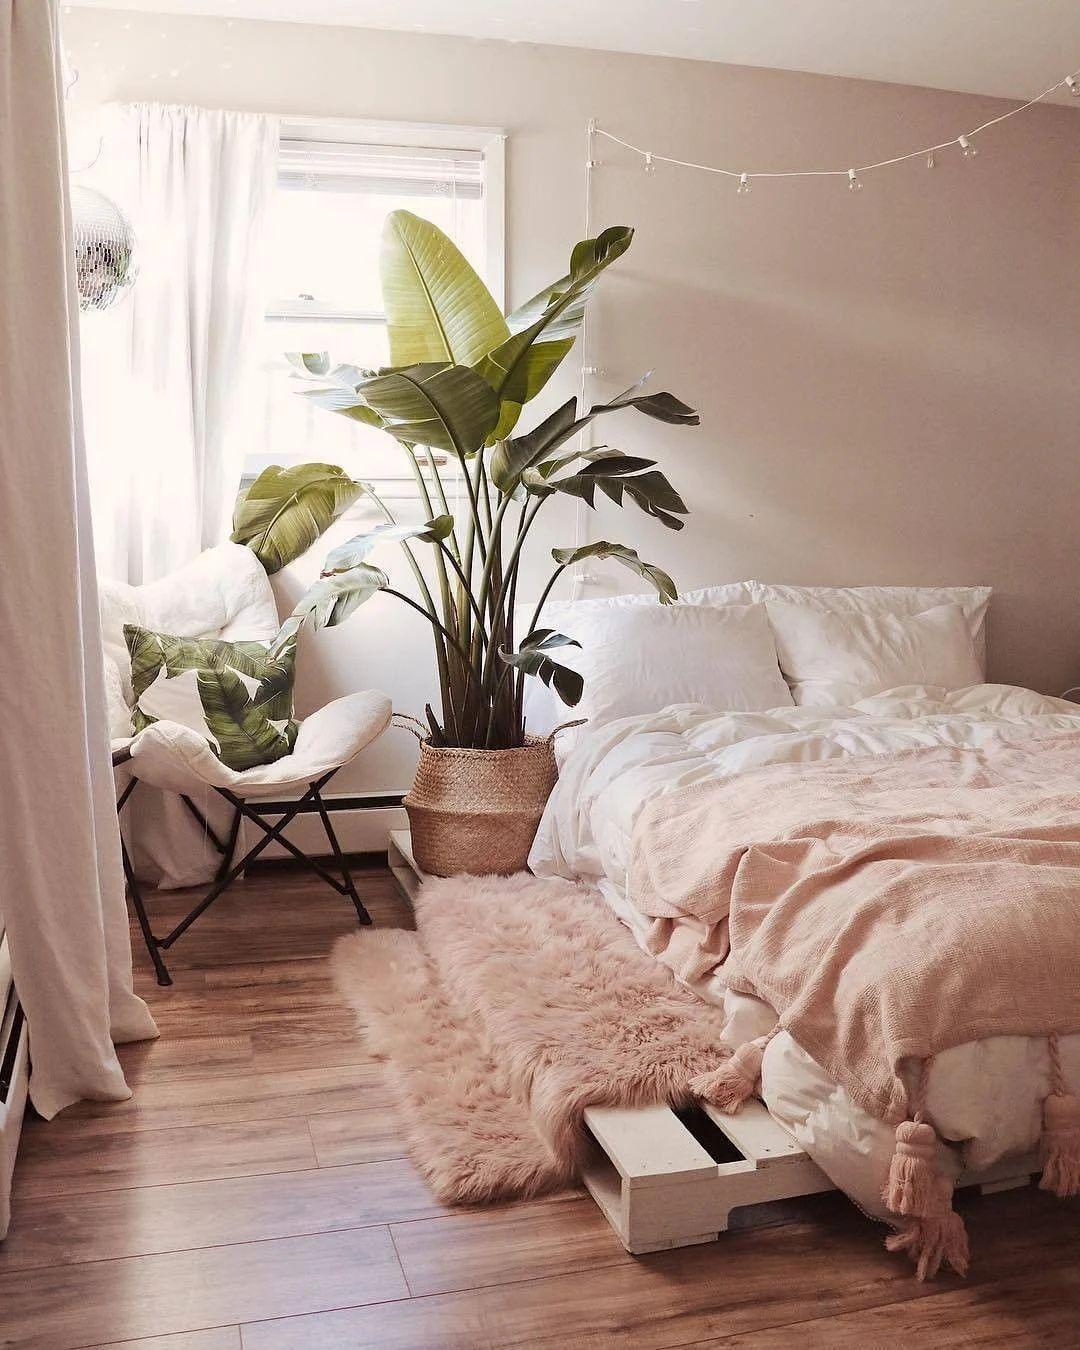 Pink Bedroom Decor Ideas Dyi Home Renovations Bedroom Decorating Tips Girly Bedroom Woman Bedroom